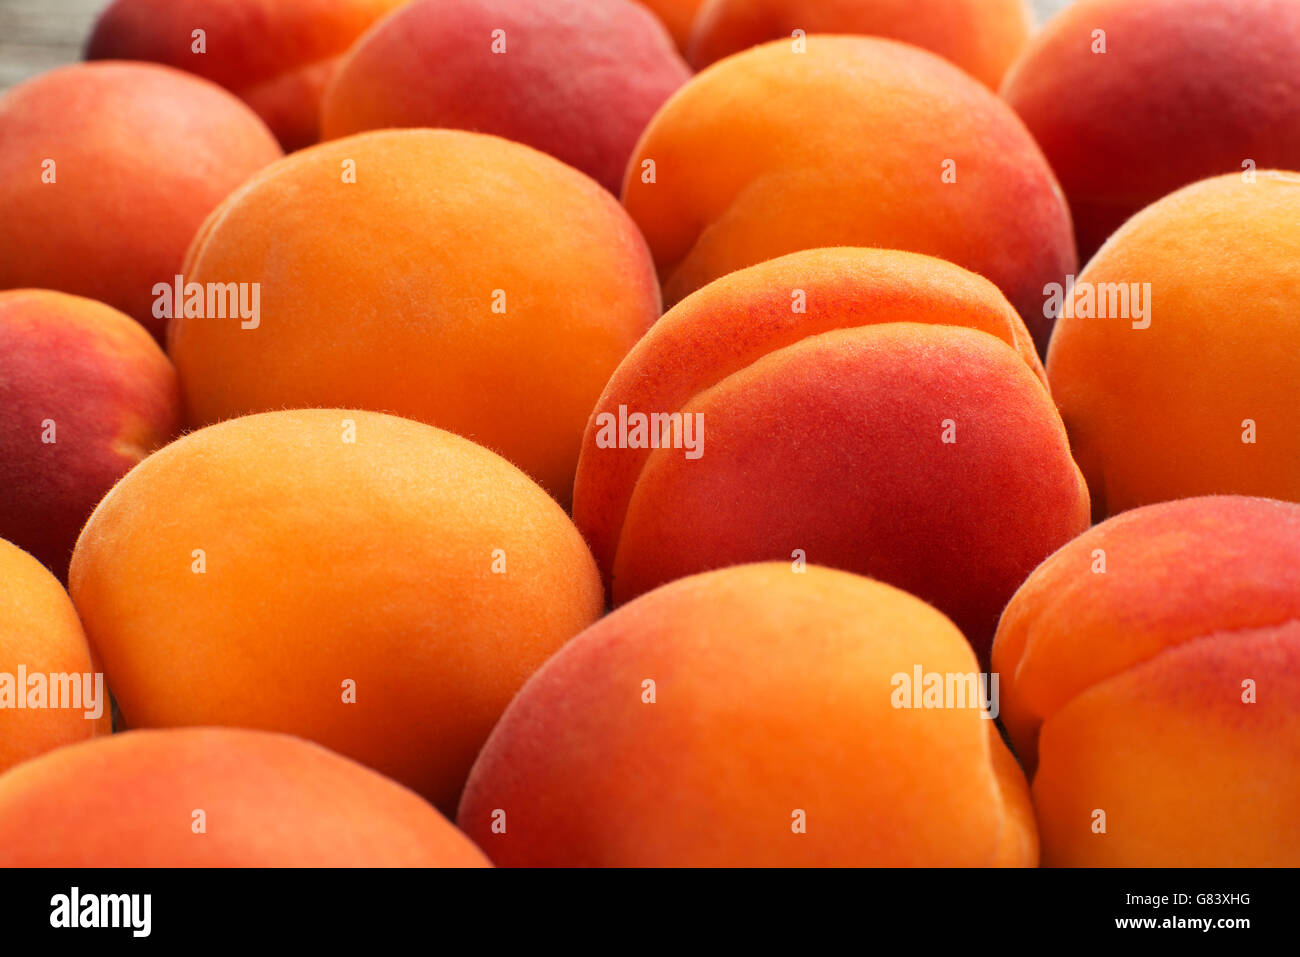 Fruits abricot frais contexte close up Photo Stock